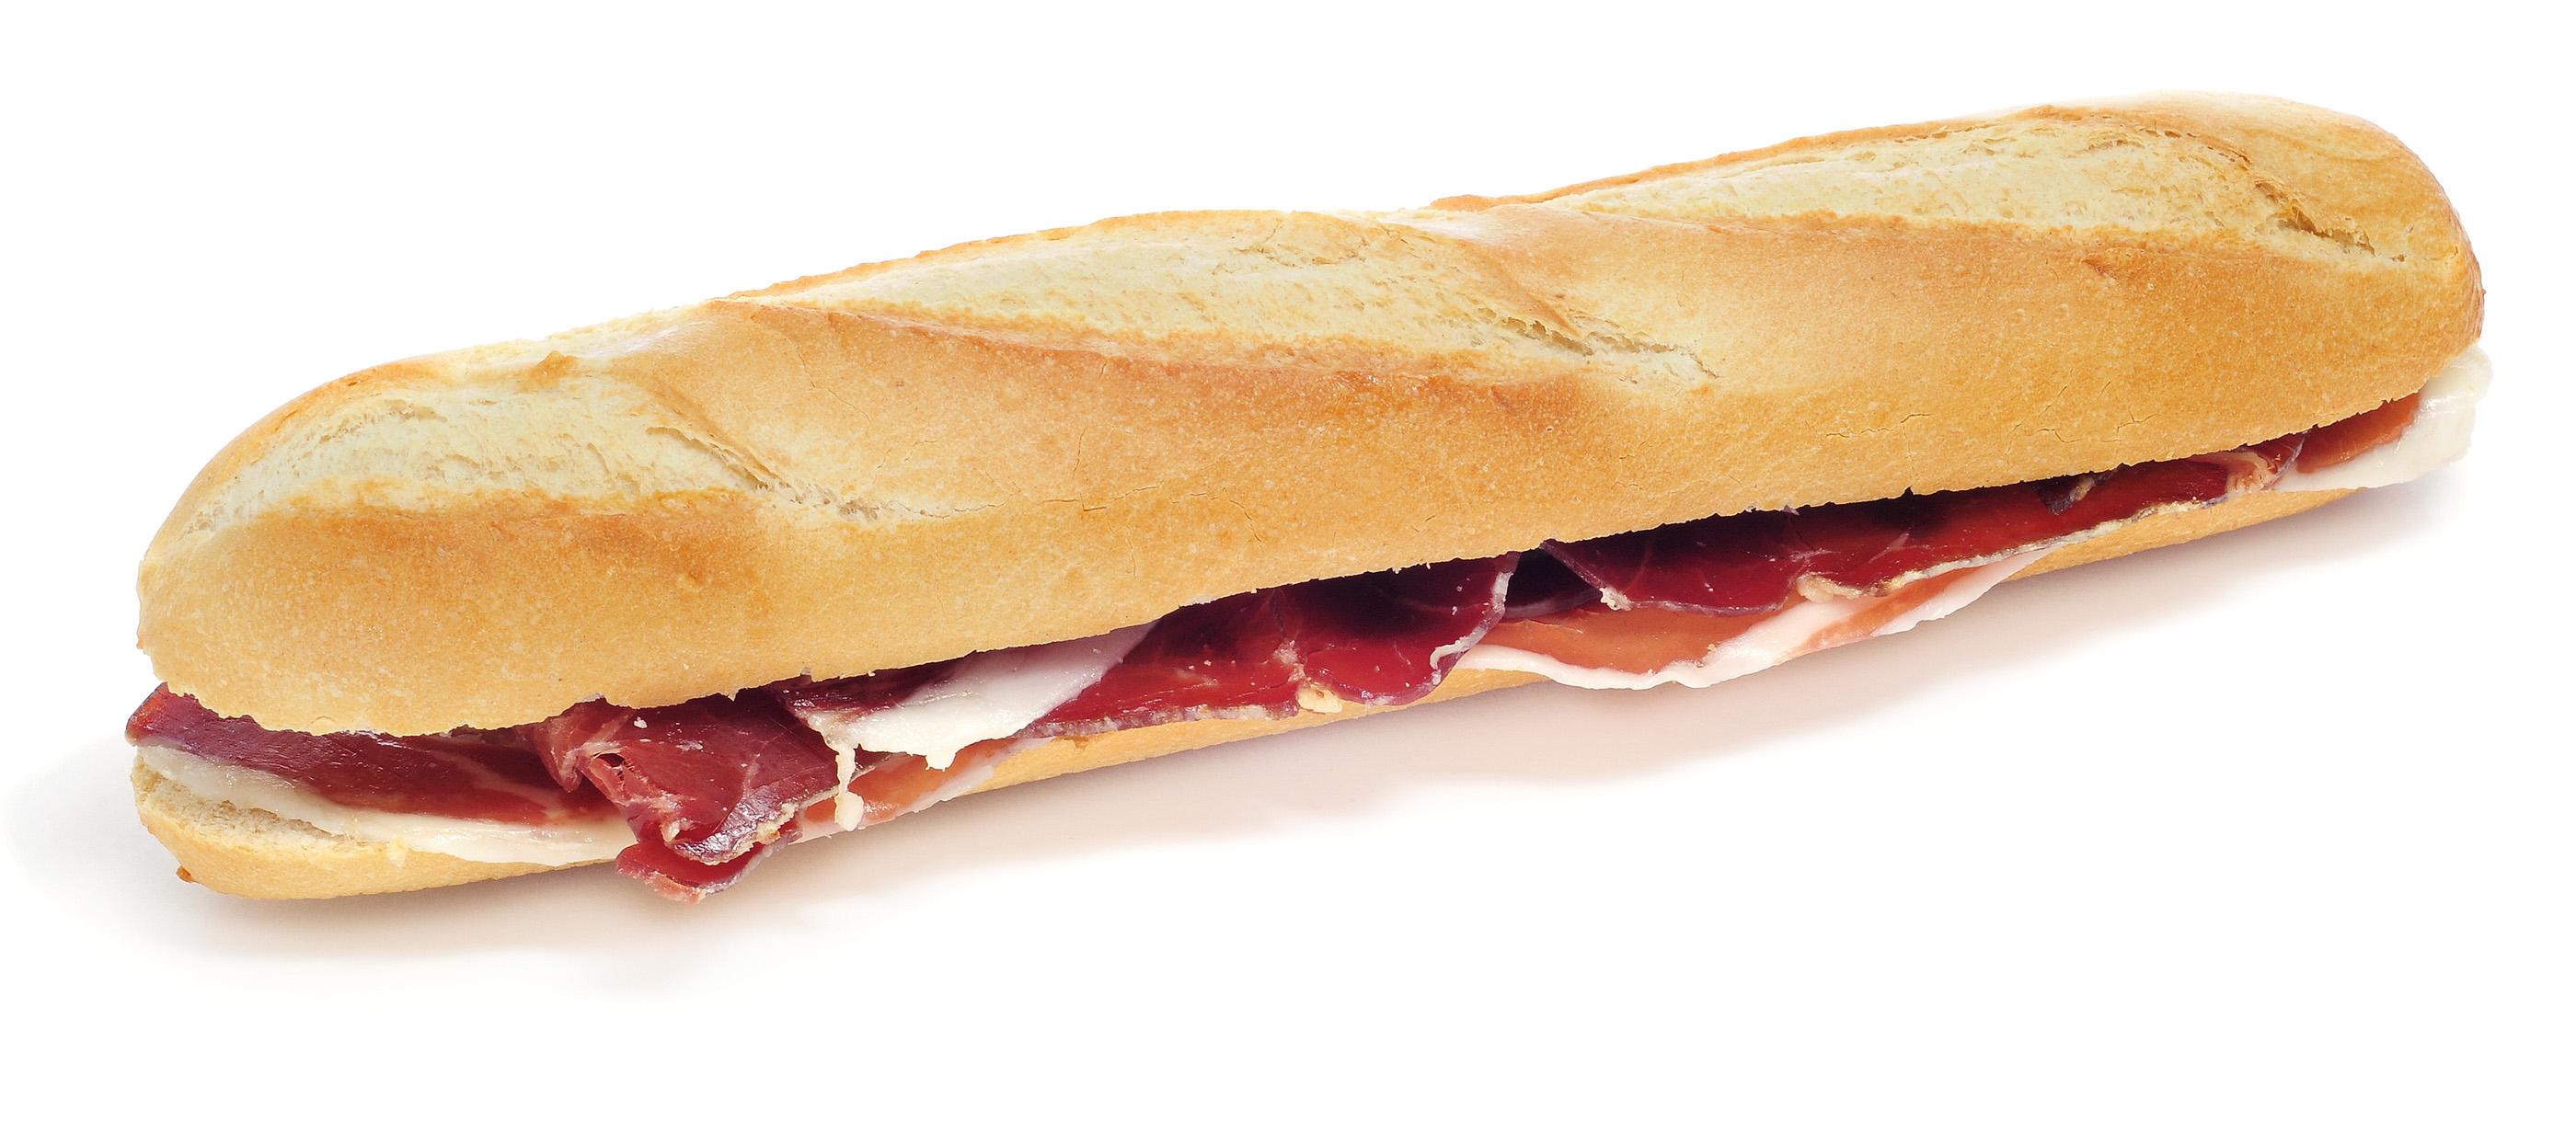 10 Most Popular Spanish Sandwiches Tasteatlas